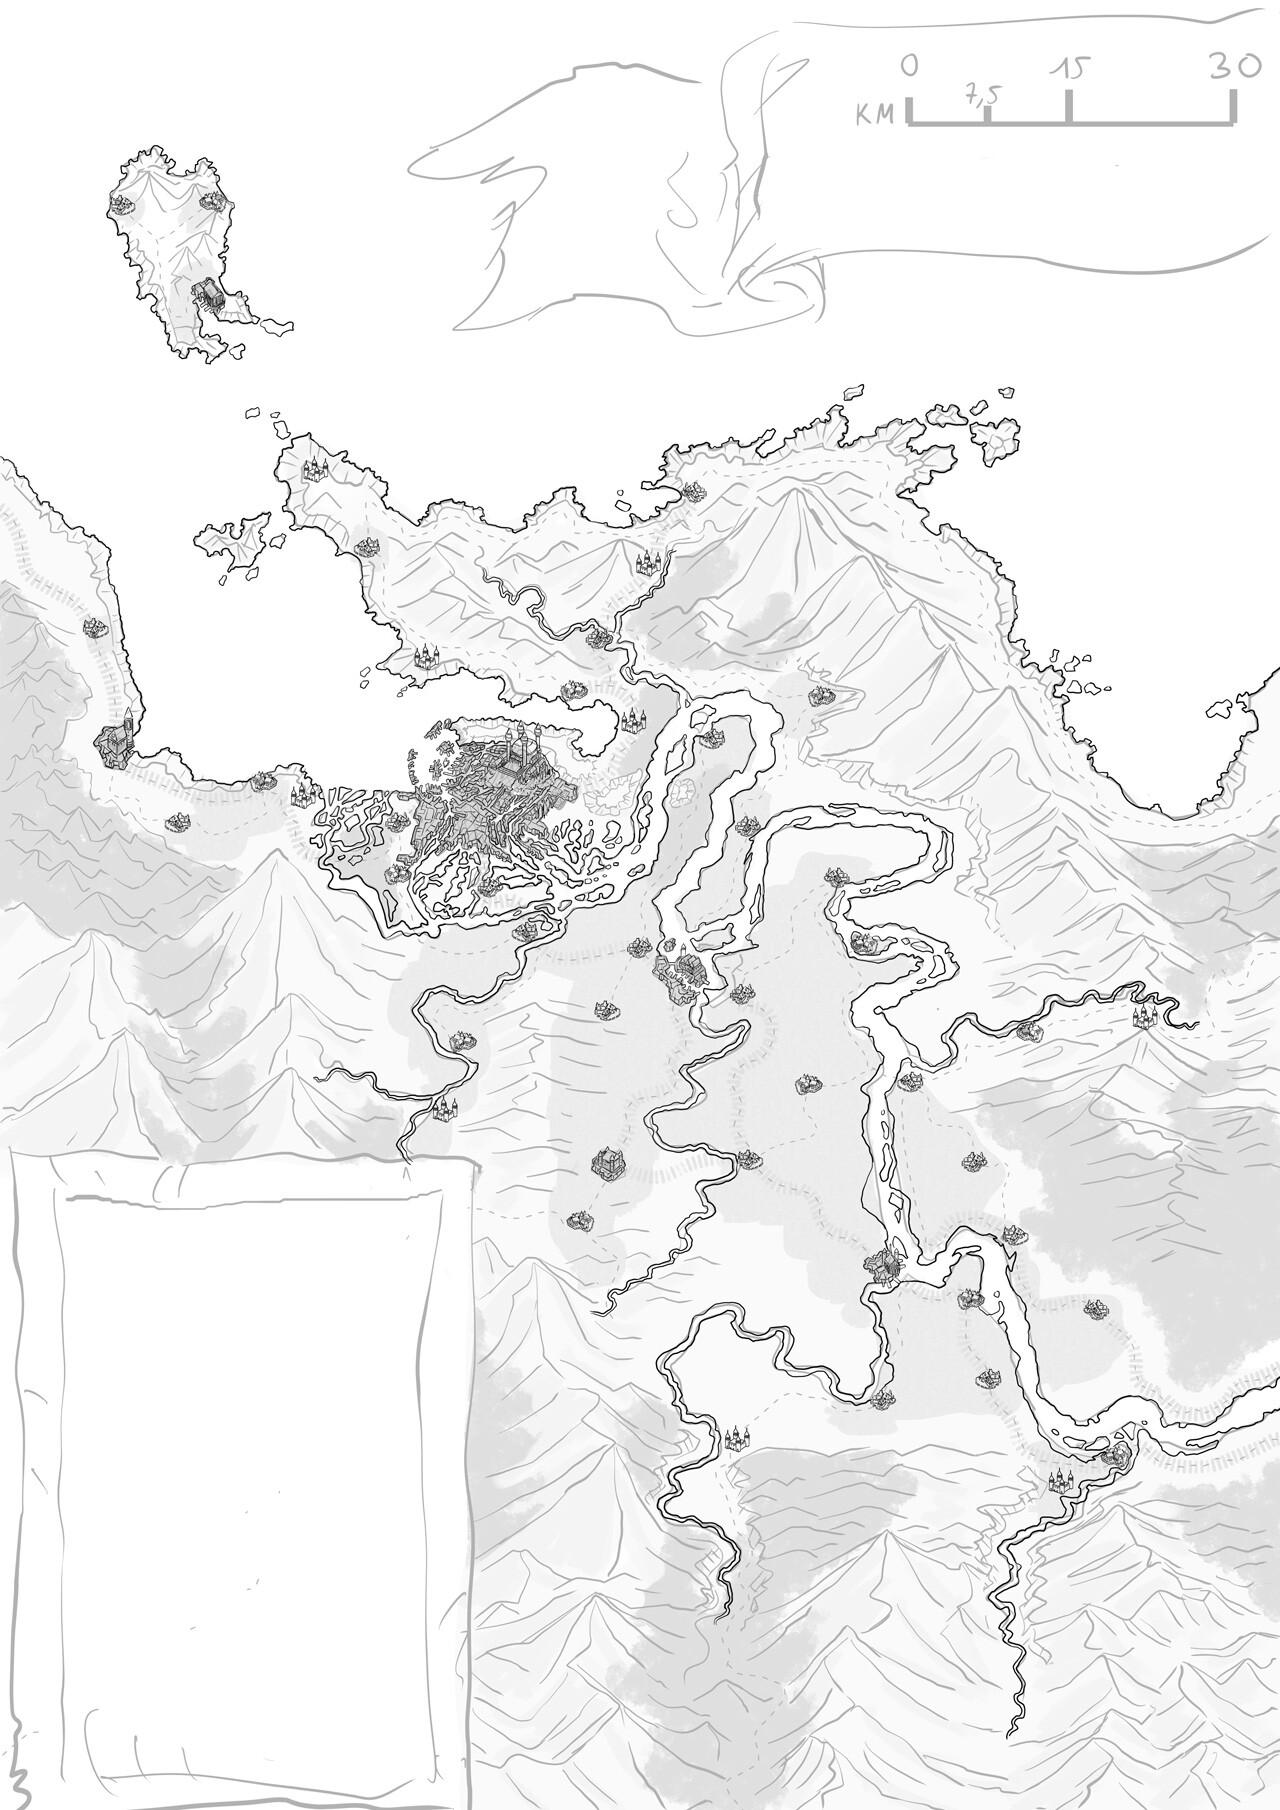 Axelle bouet carte region armanth5